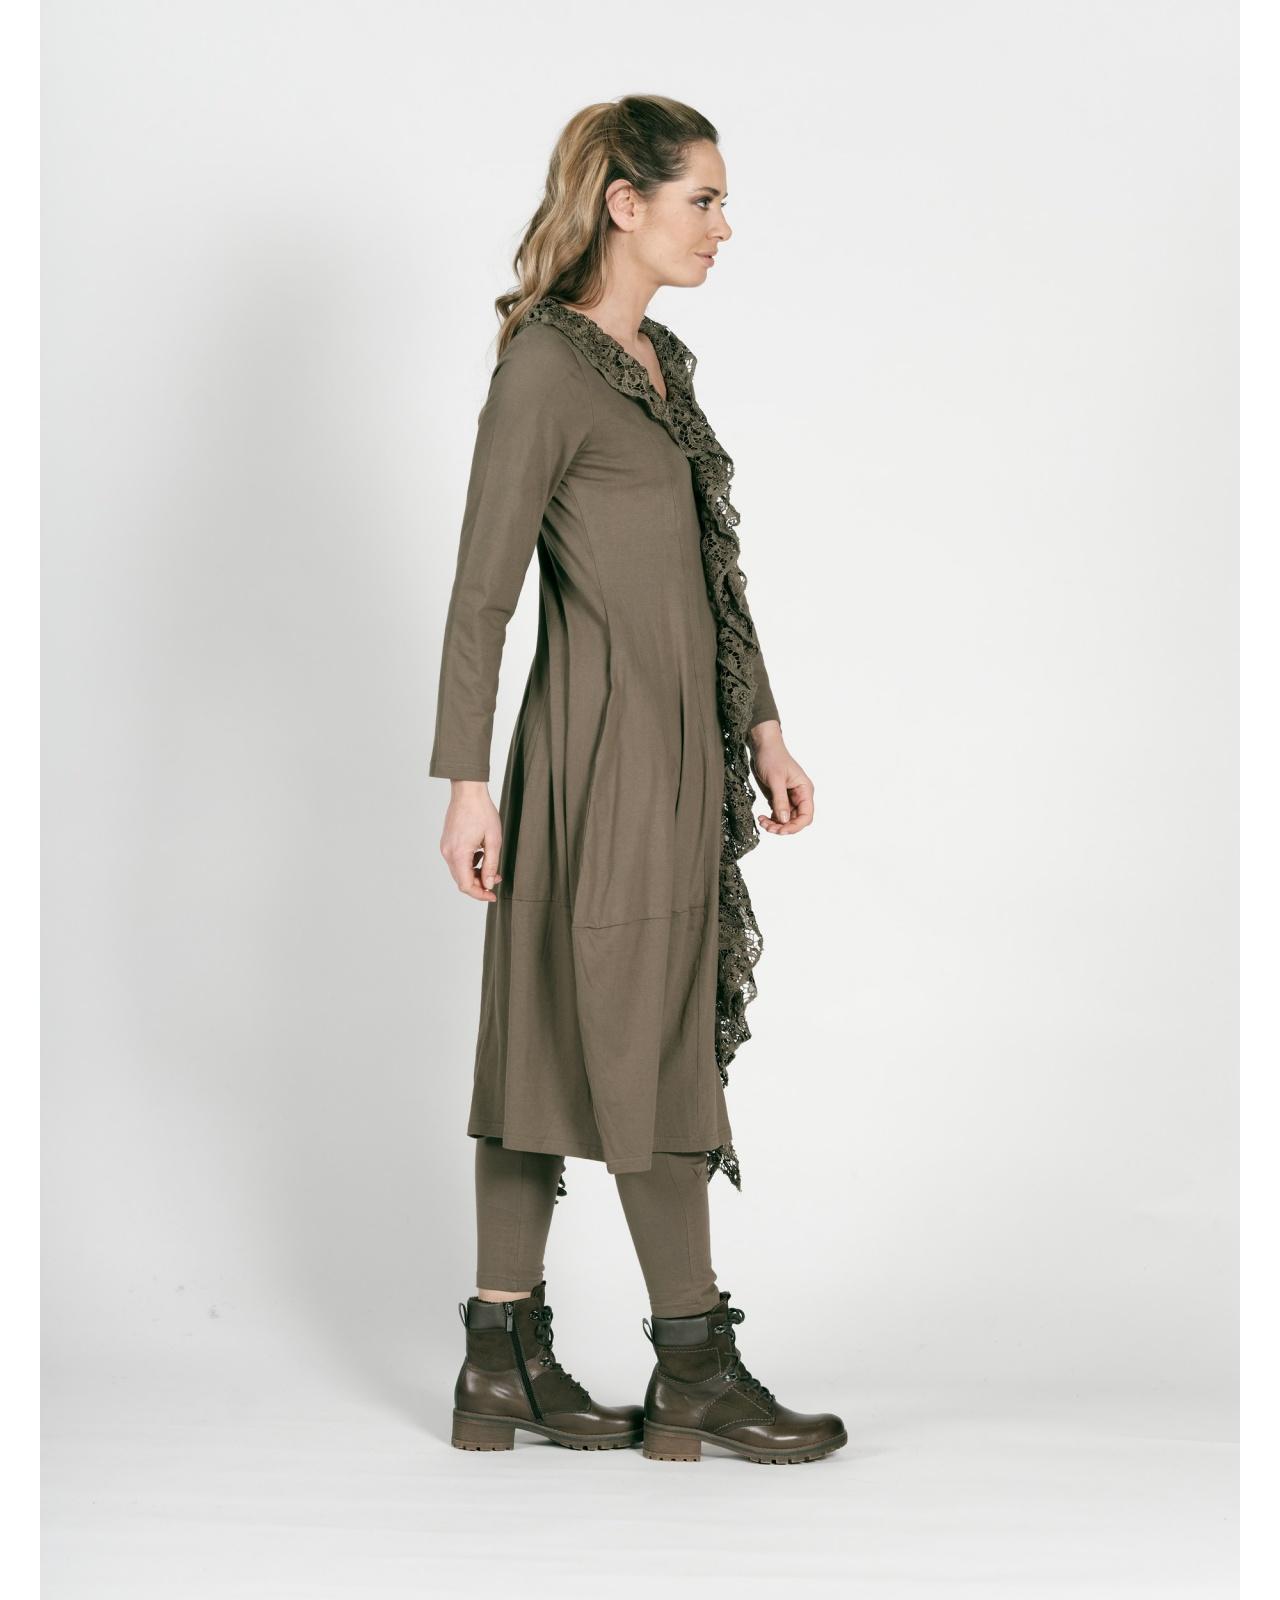 DRESS APPOLINE N°78